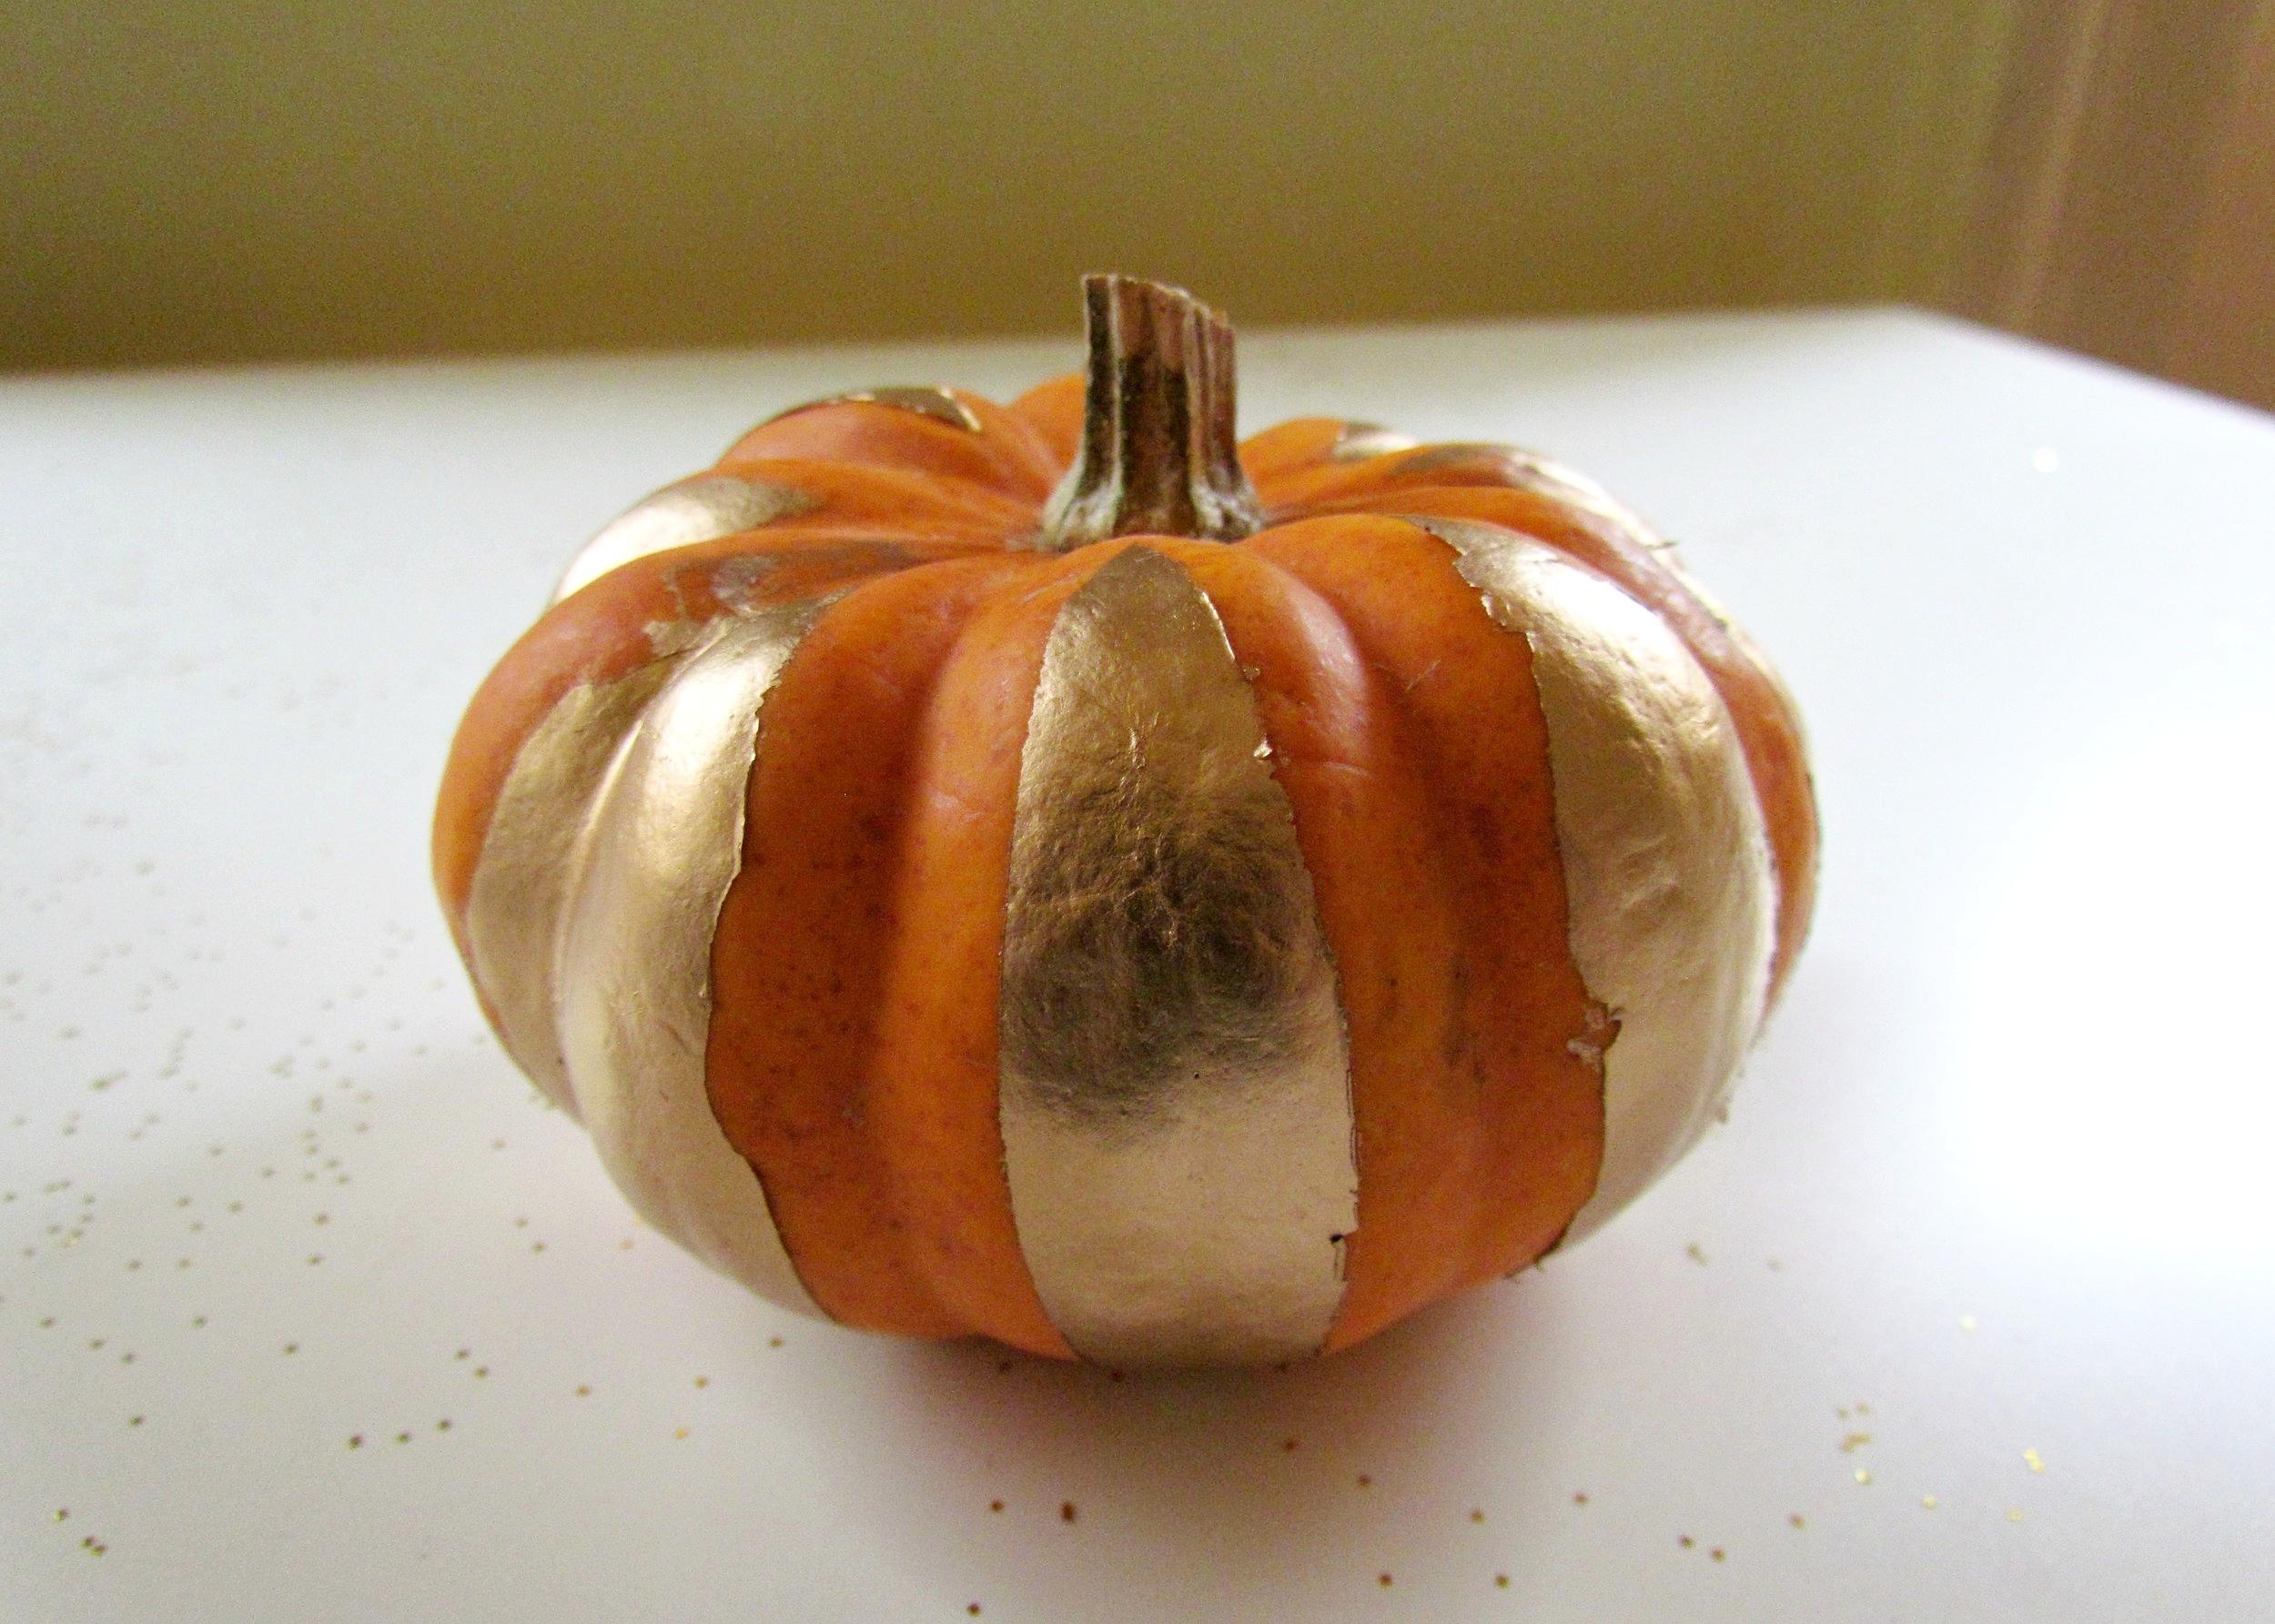 DIY Spray Painted Pumpkins by Isoscella